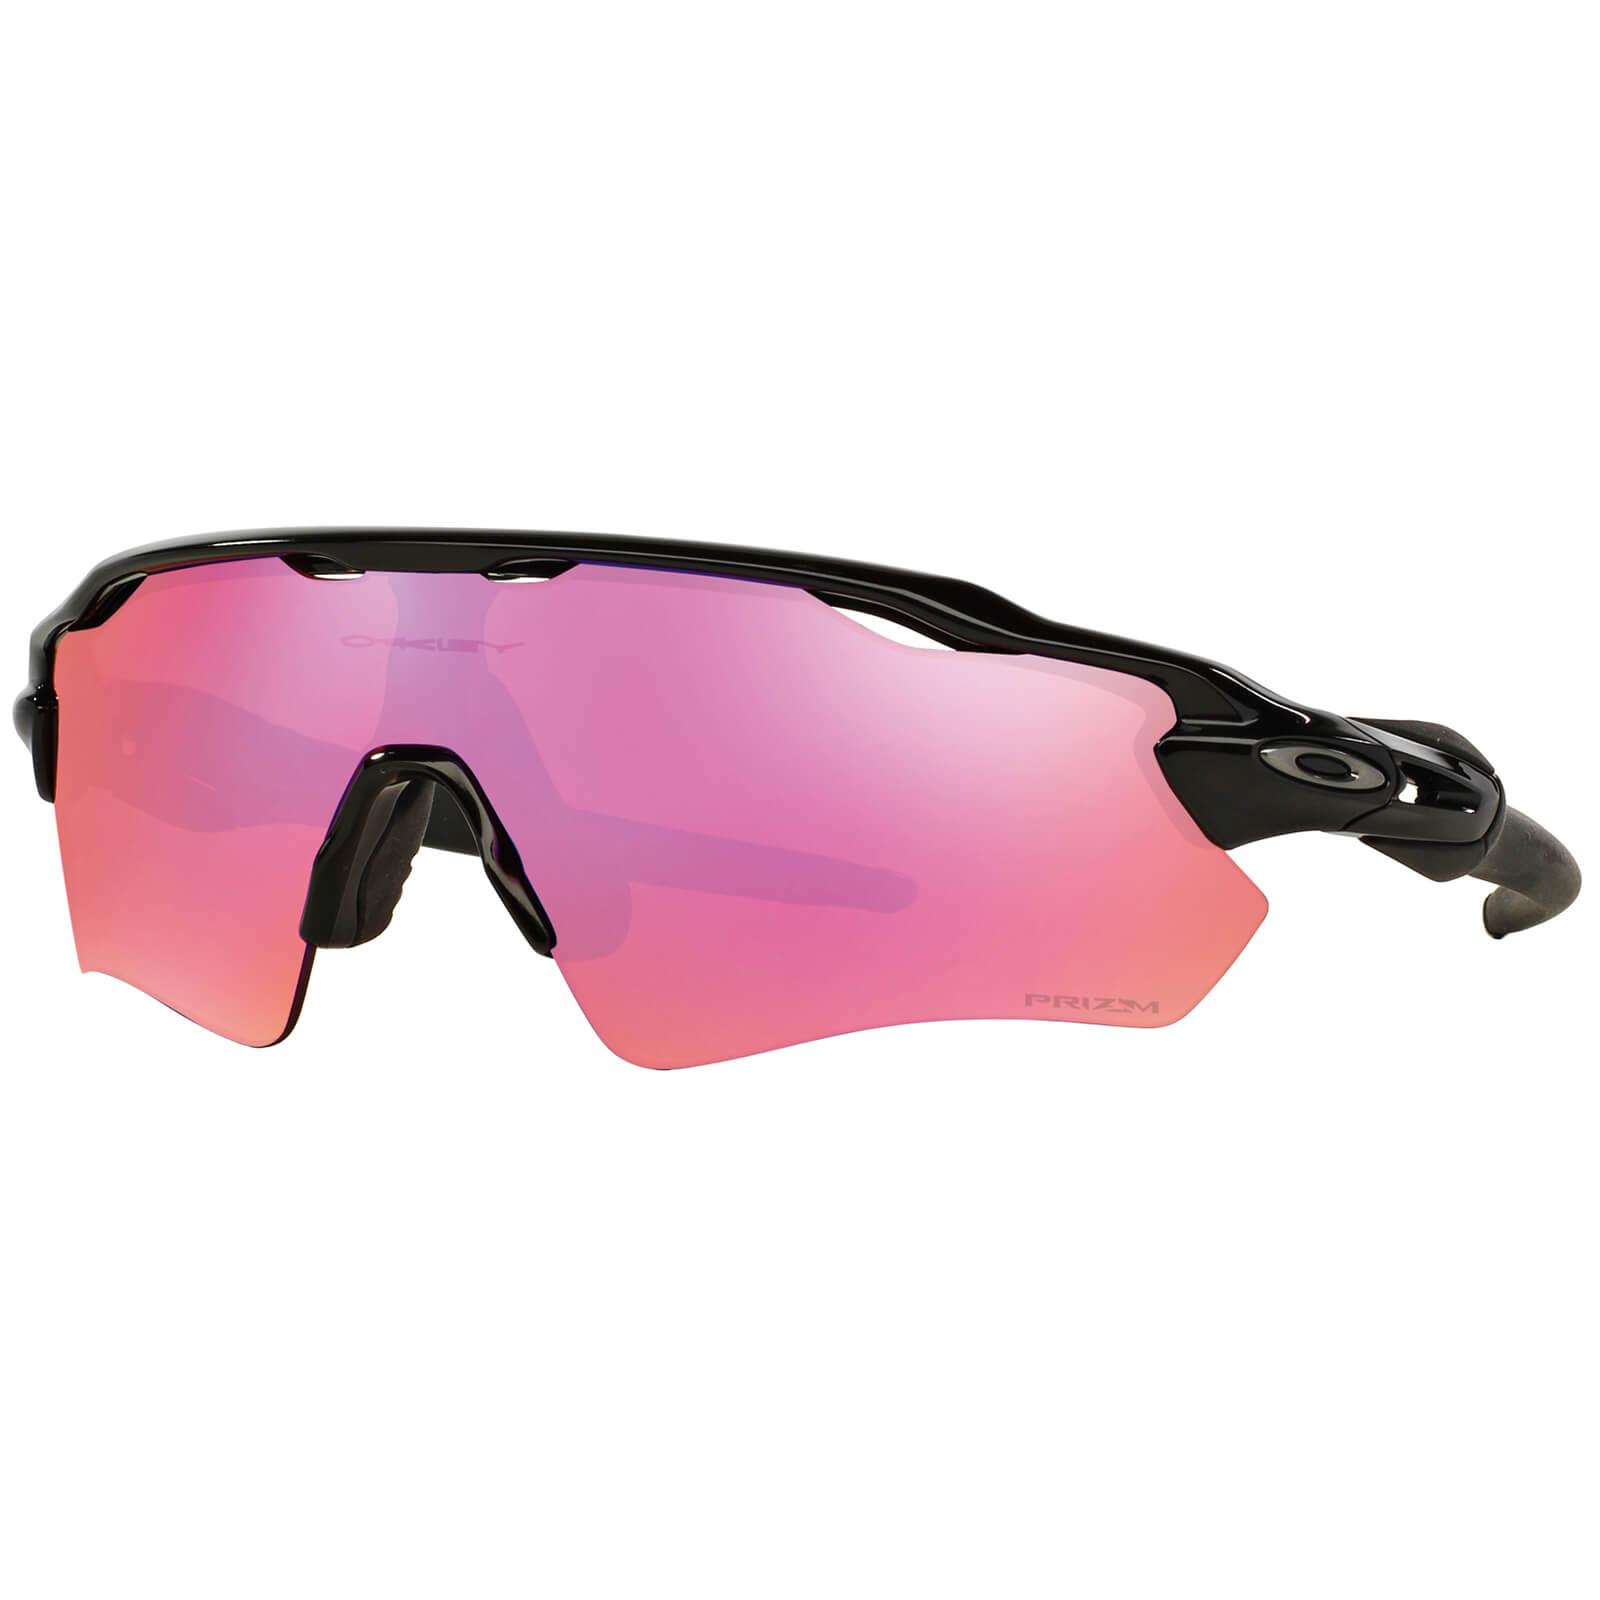 833f6f9bdf5 Oakley Radar EV Path Sunglasses - Polished Black Prizm Trail ...